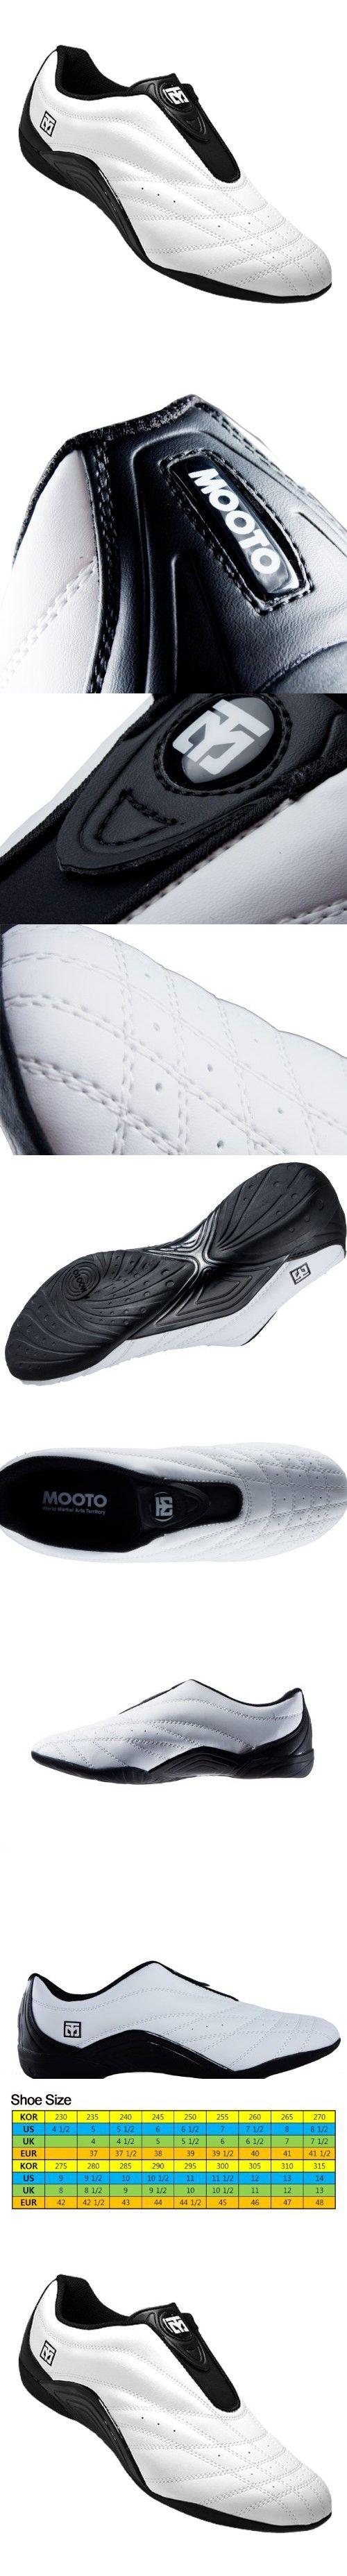 Mooto Wings Korea TaeKwonDo Shoes TKD Competition Twotone & Black 4 1/2 to 14 (Black & White, 280mm(US 9 1/2))